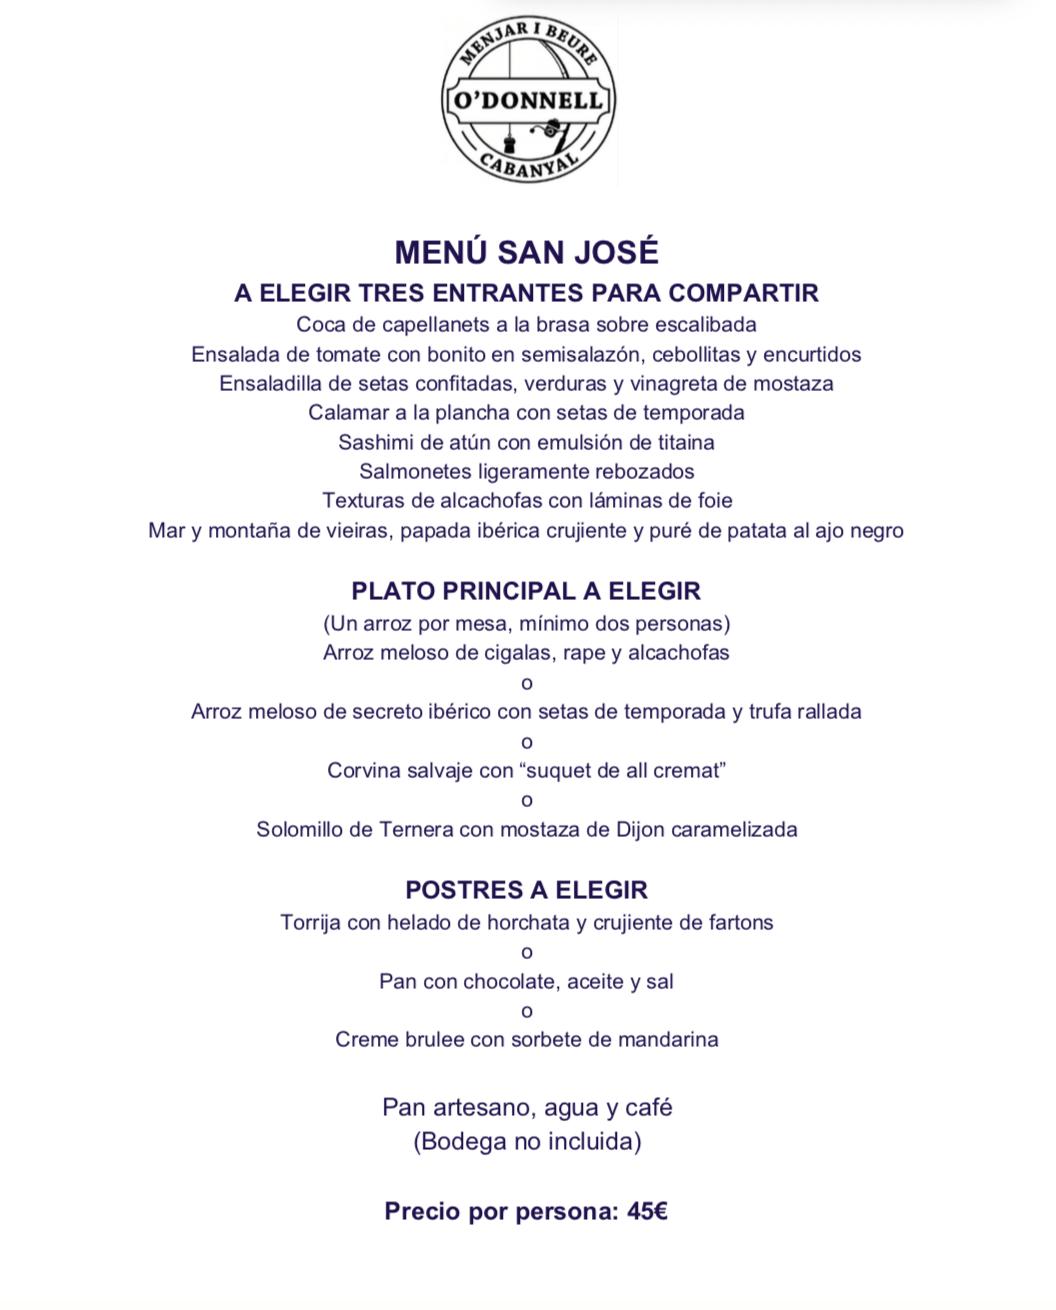 Menú Día de San José en O´DONNELL CABANYAL